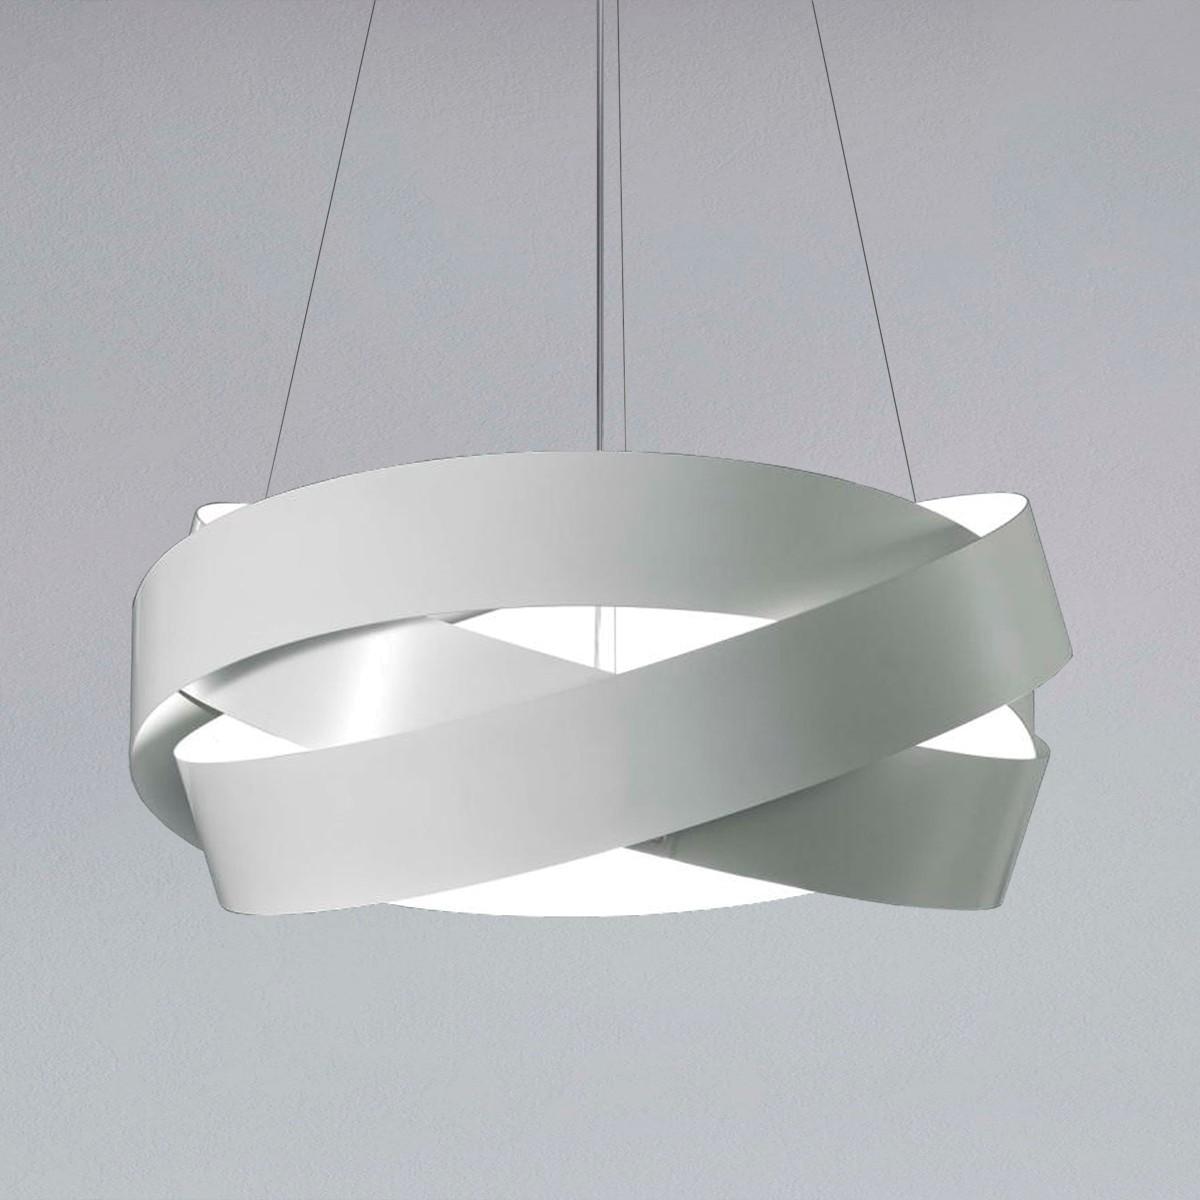 MARCHETTI Pura S60 LED Pendelleuchte, weiß